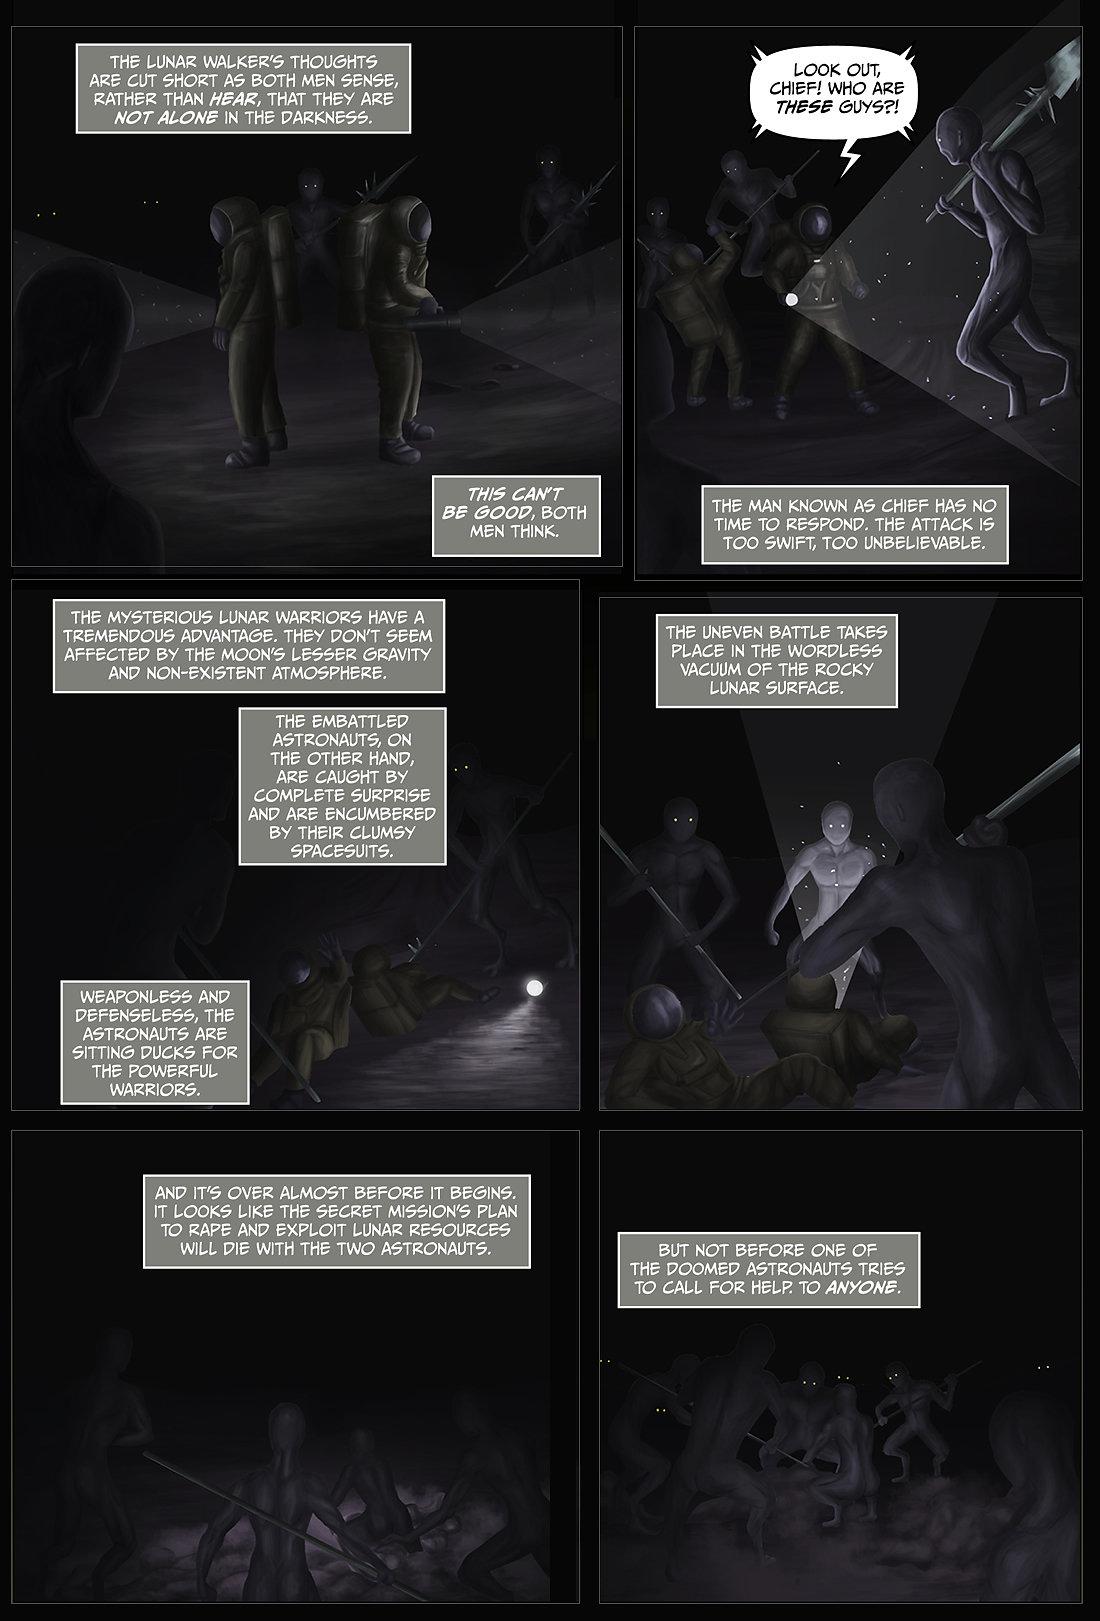 DarkSideoftheMoon_2_sm.jpg